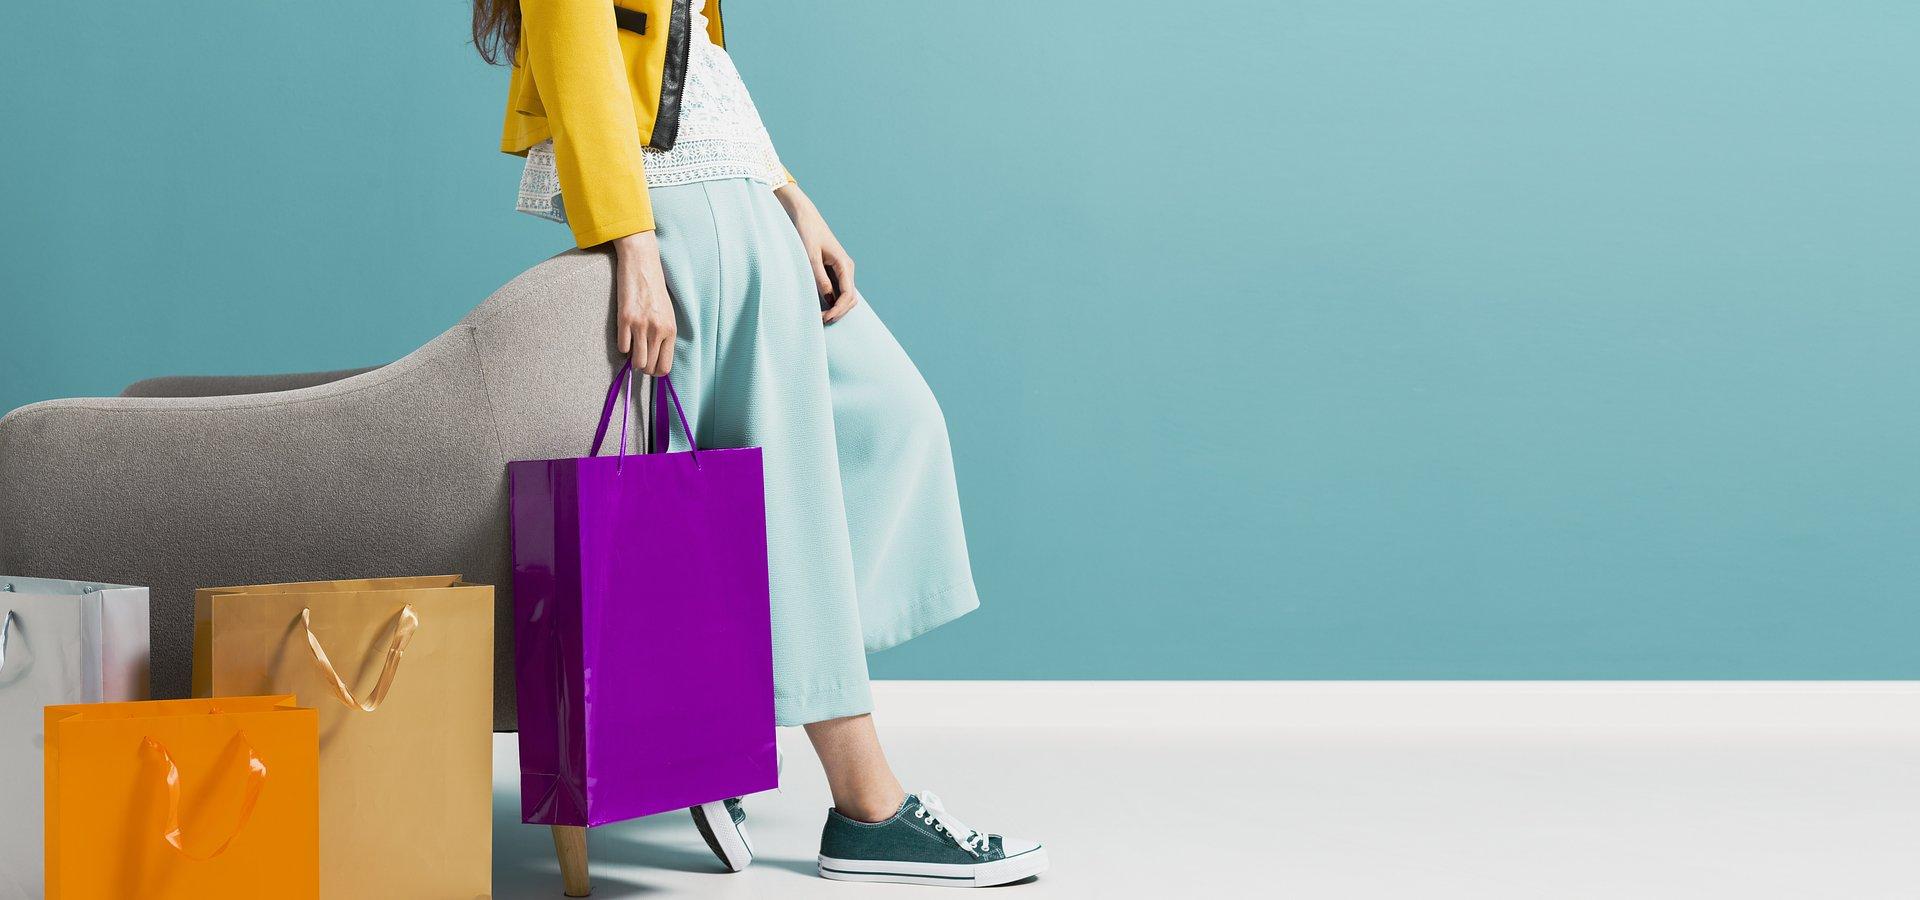 Raport: #fashionklika 2020